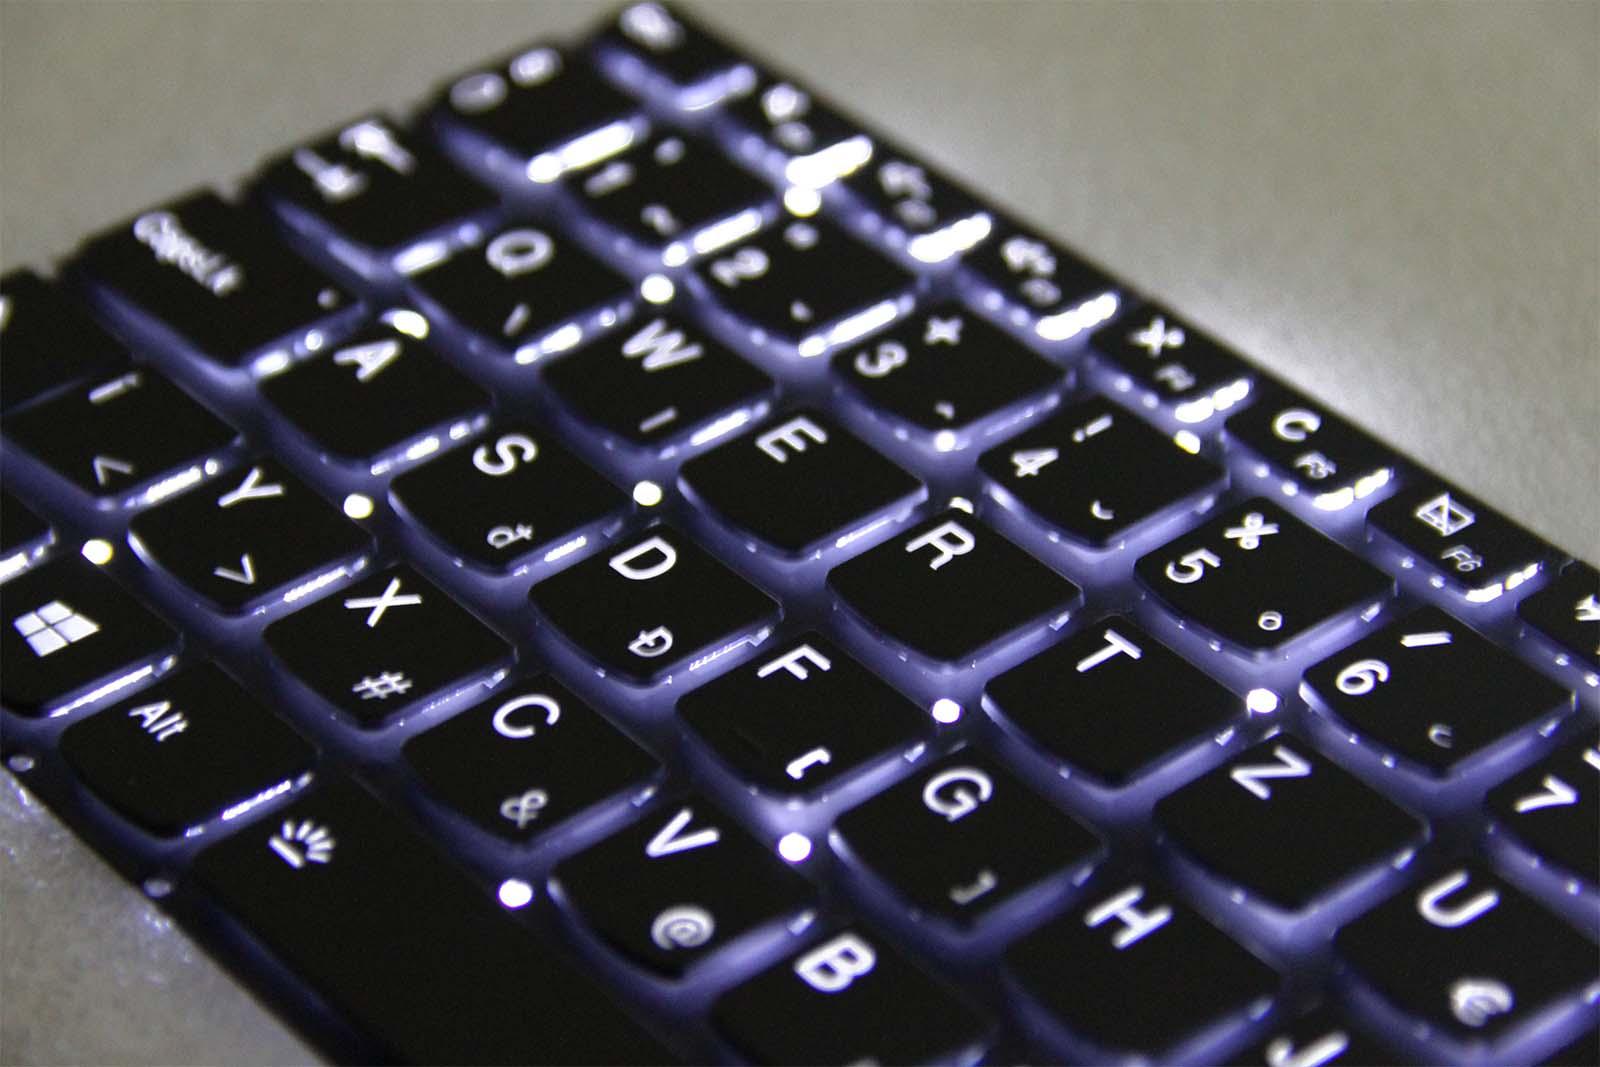 HU Magyar Hungarian Backlit keyboard for Lenovo ideaPad 320S-13IKB Type 81AK